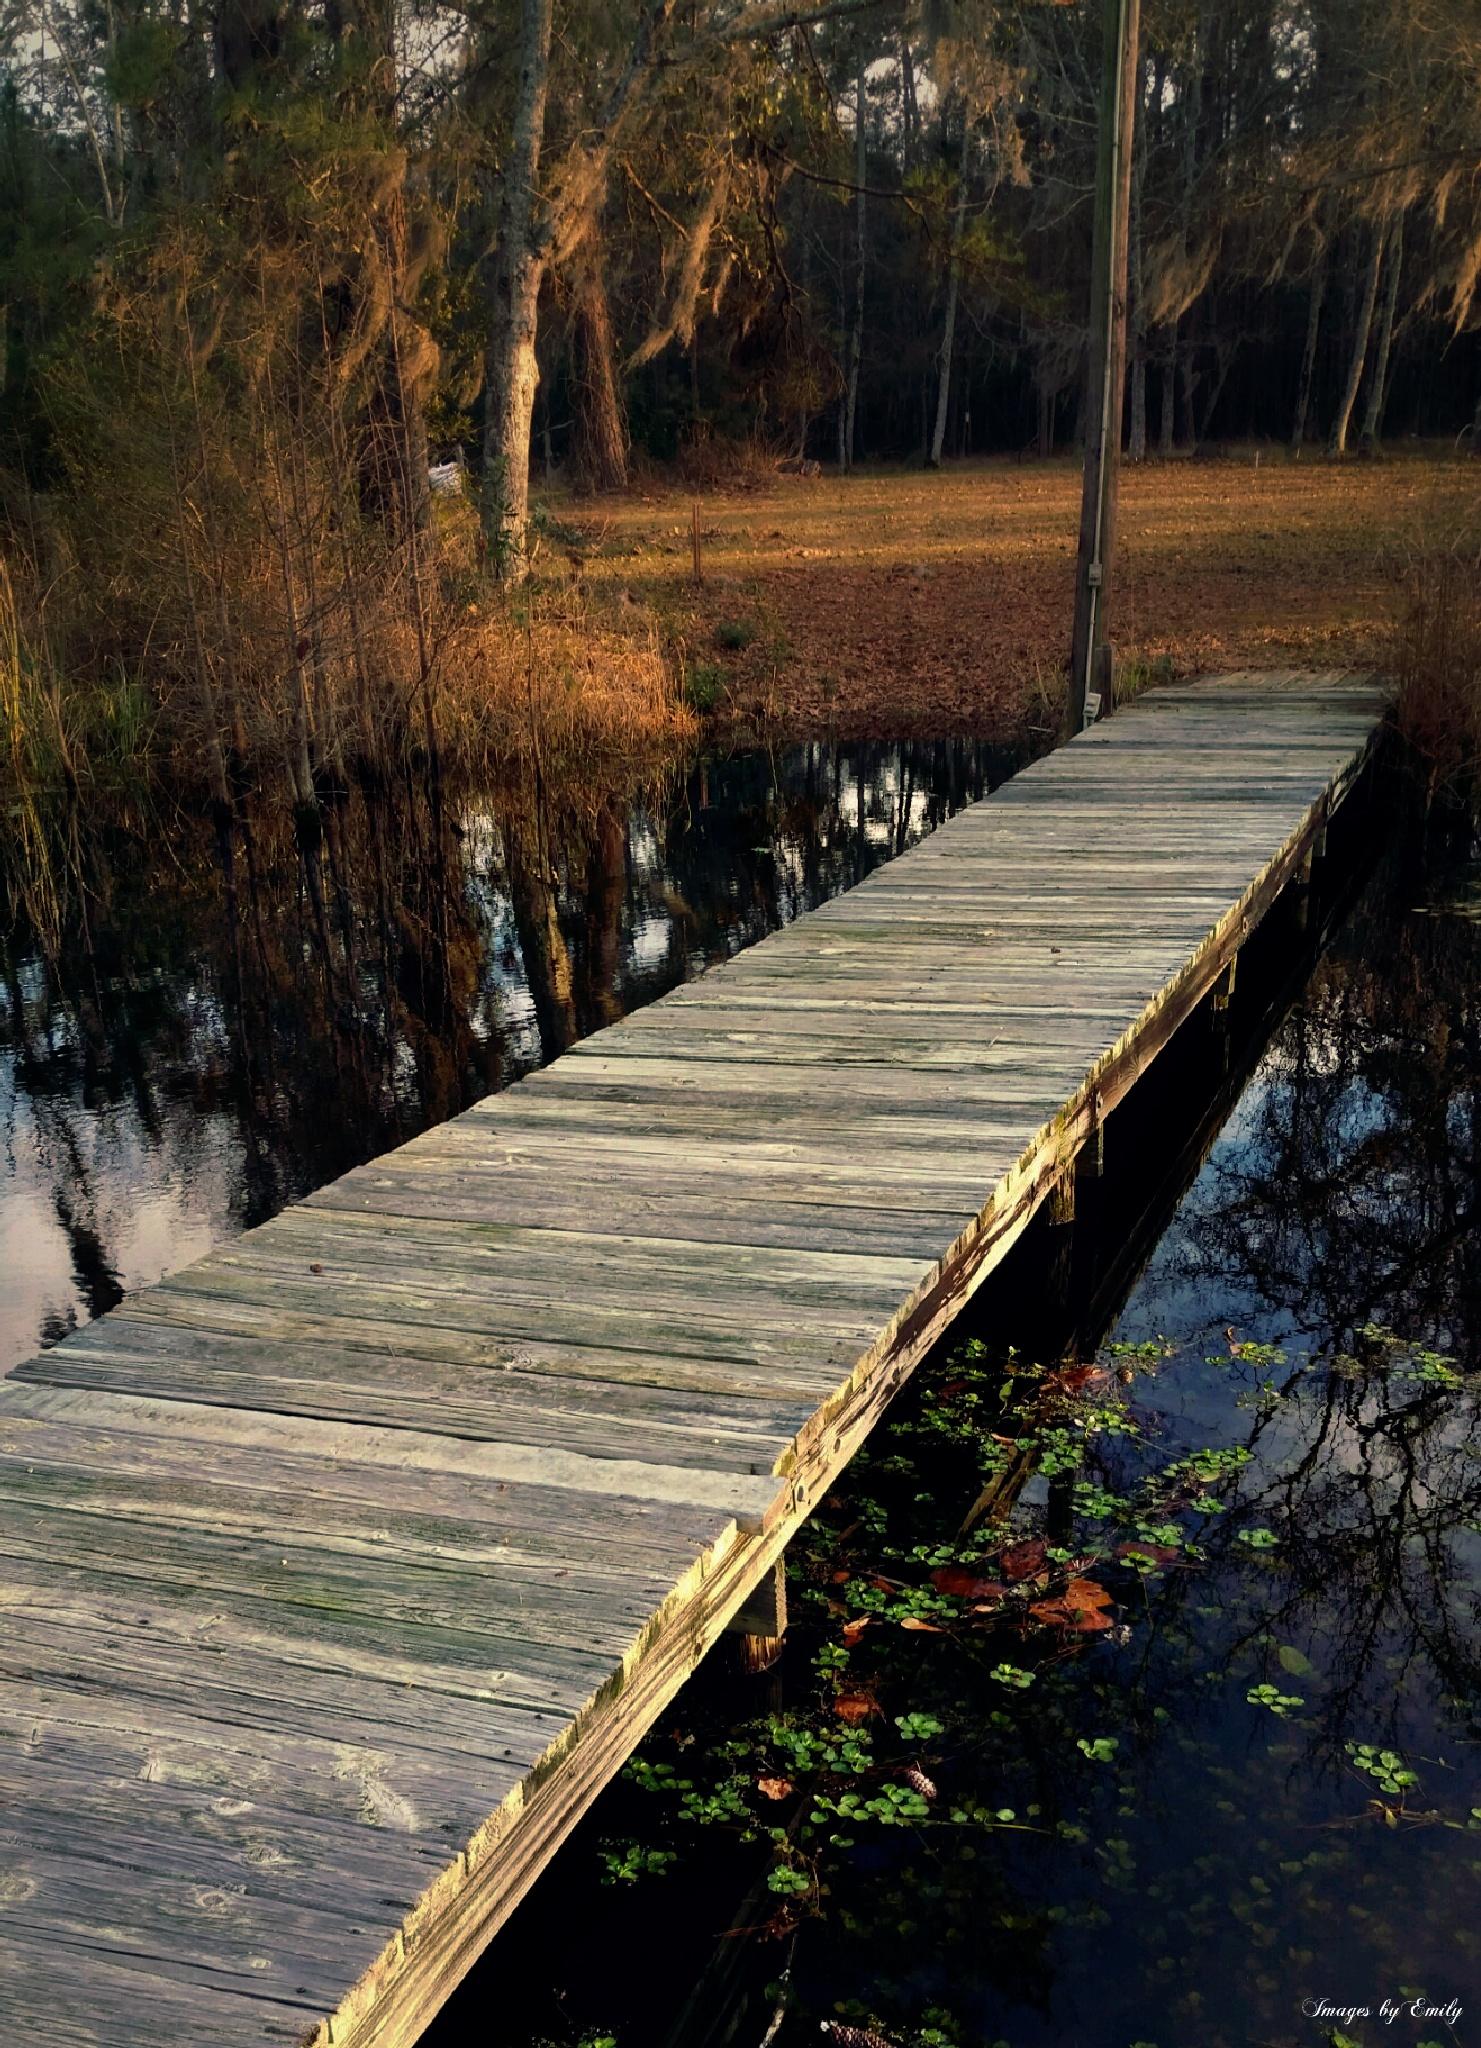 The Bridge by Emily Grant